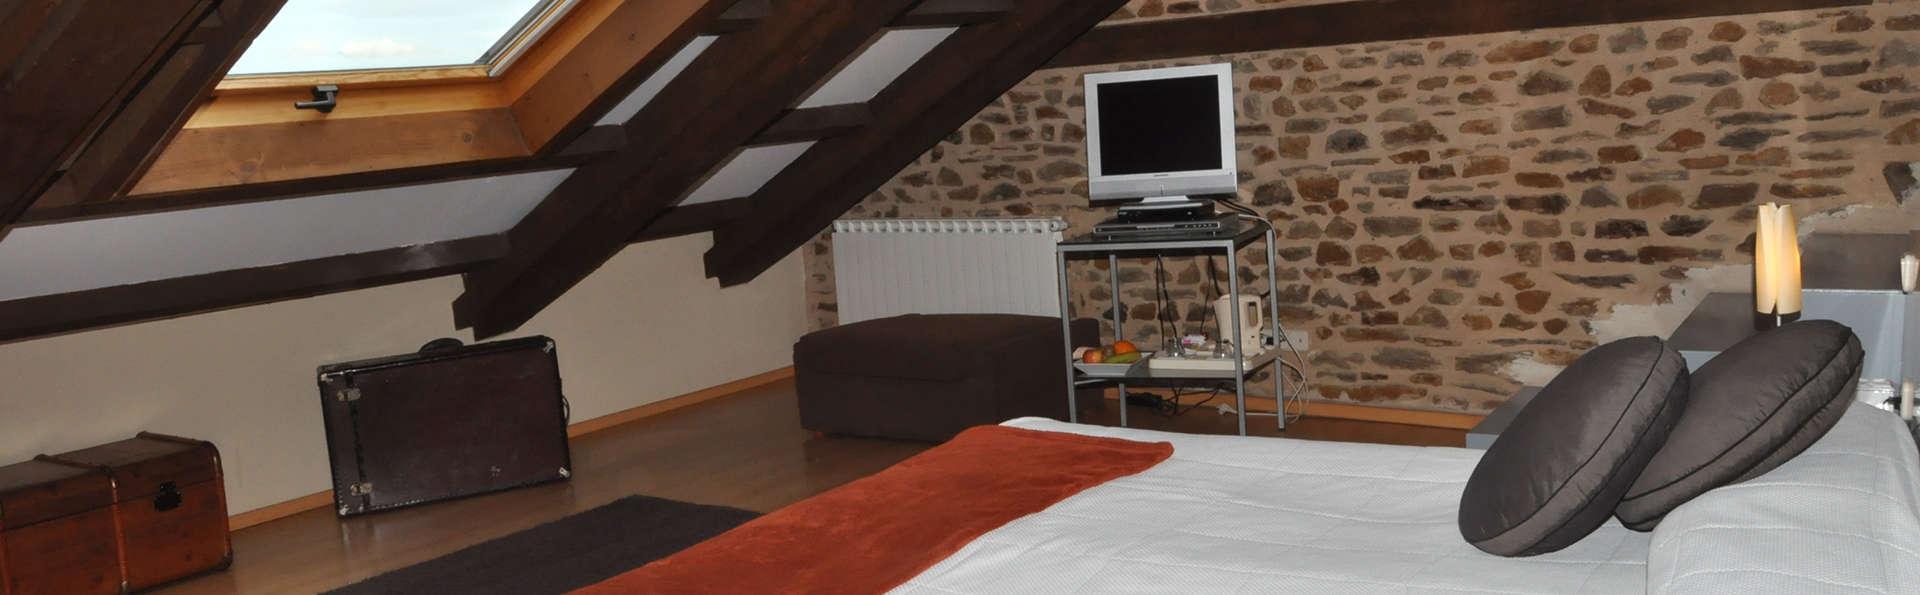 Hotel Posada Real la Carteria - Edit_Suite3.jpg